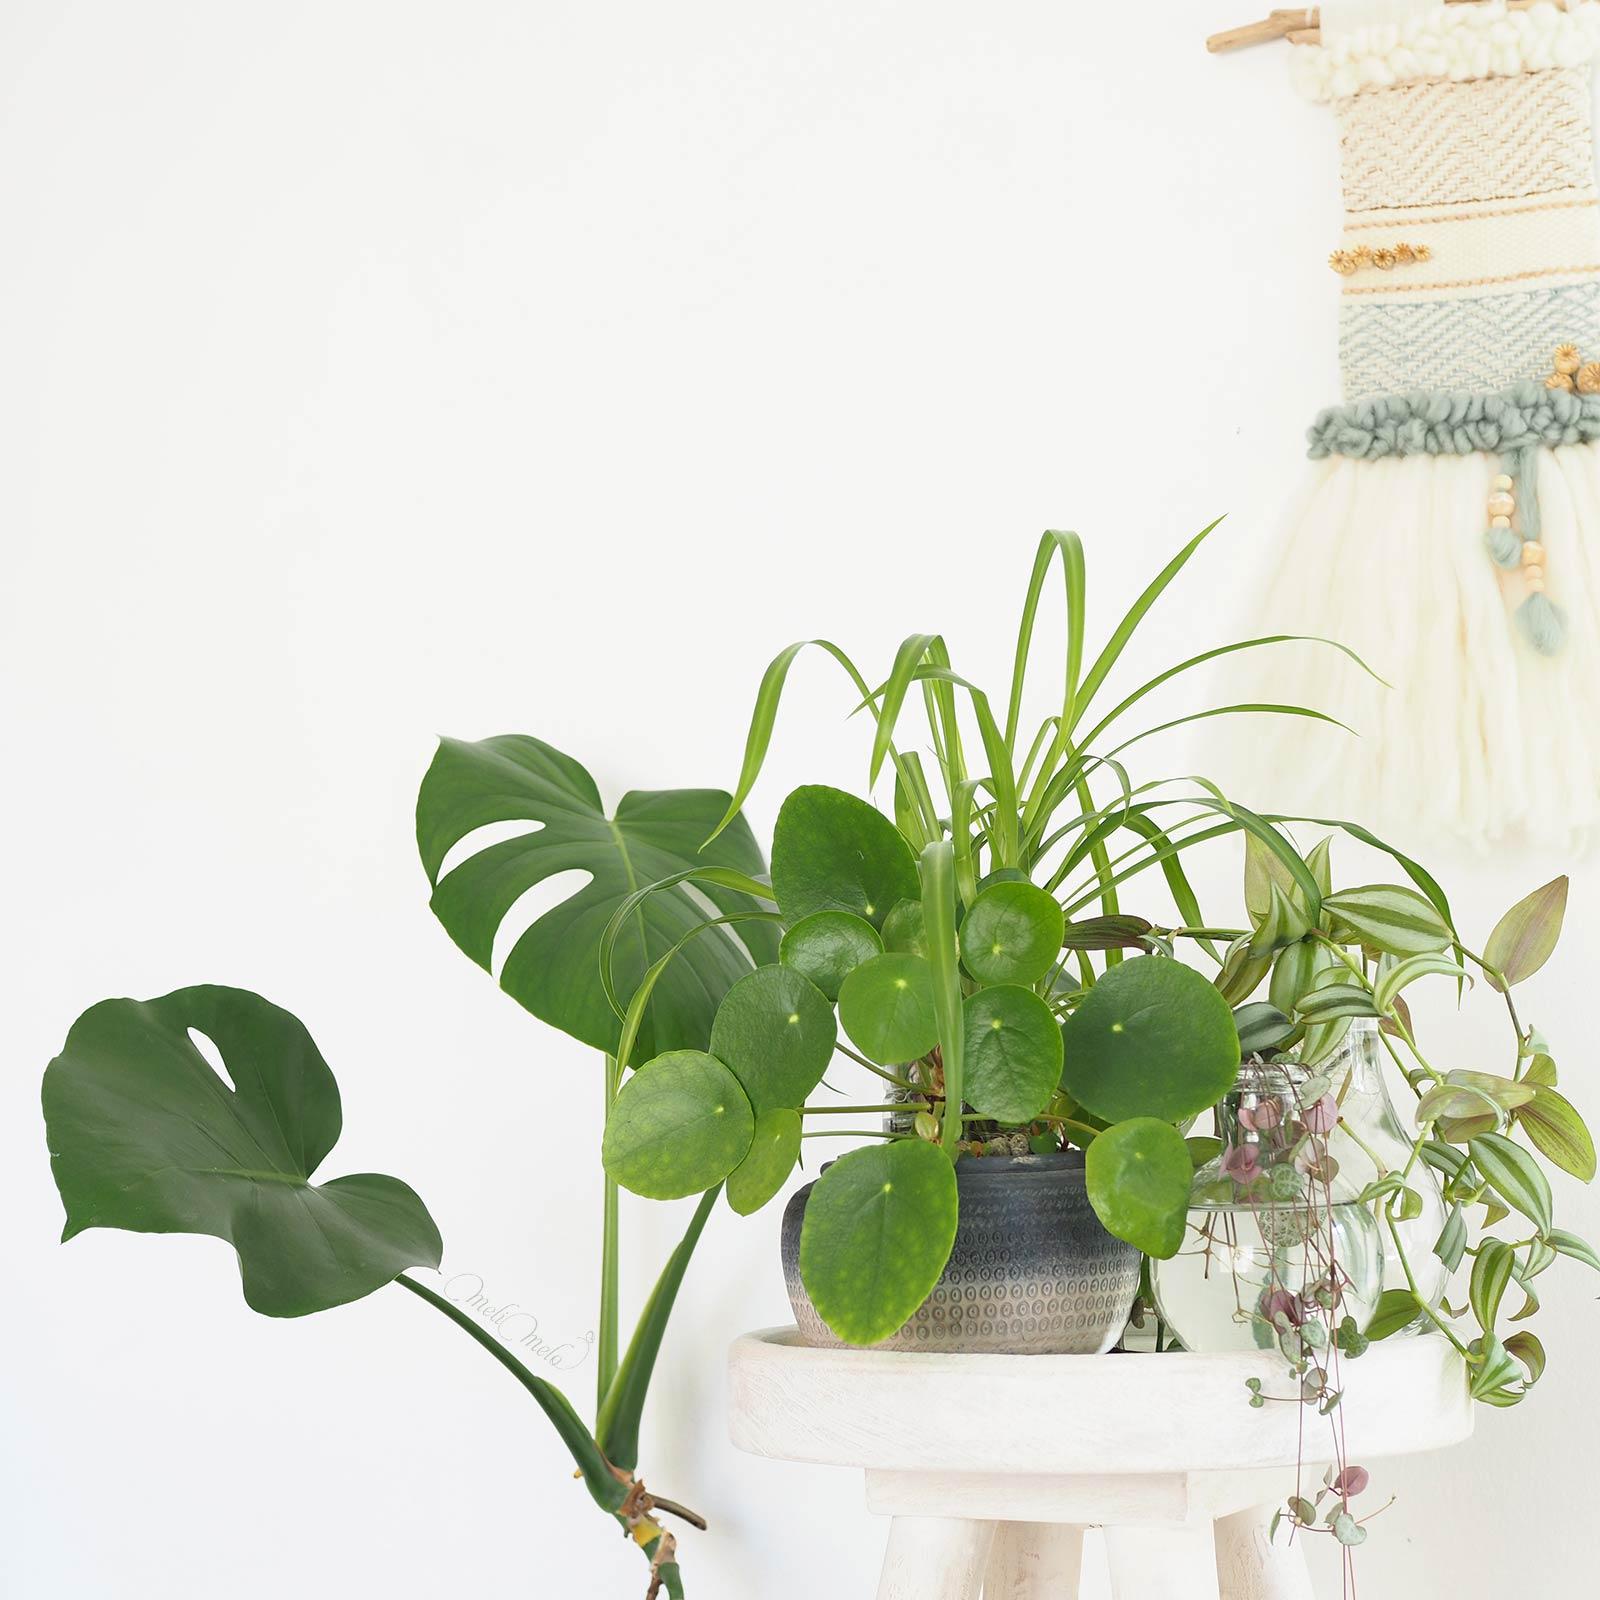 boutures-urban-jungle-pilea-peperomioides-misere-monstera-deliciosa-laboutiquedemelimelo